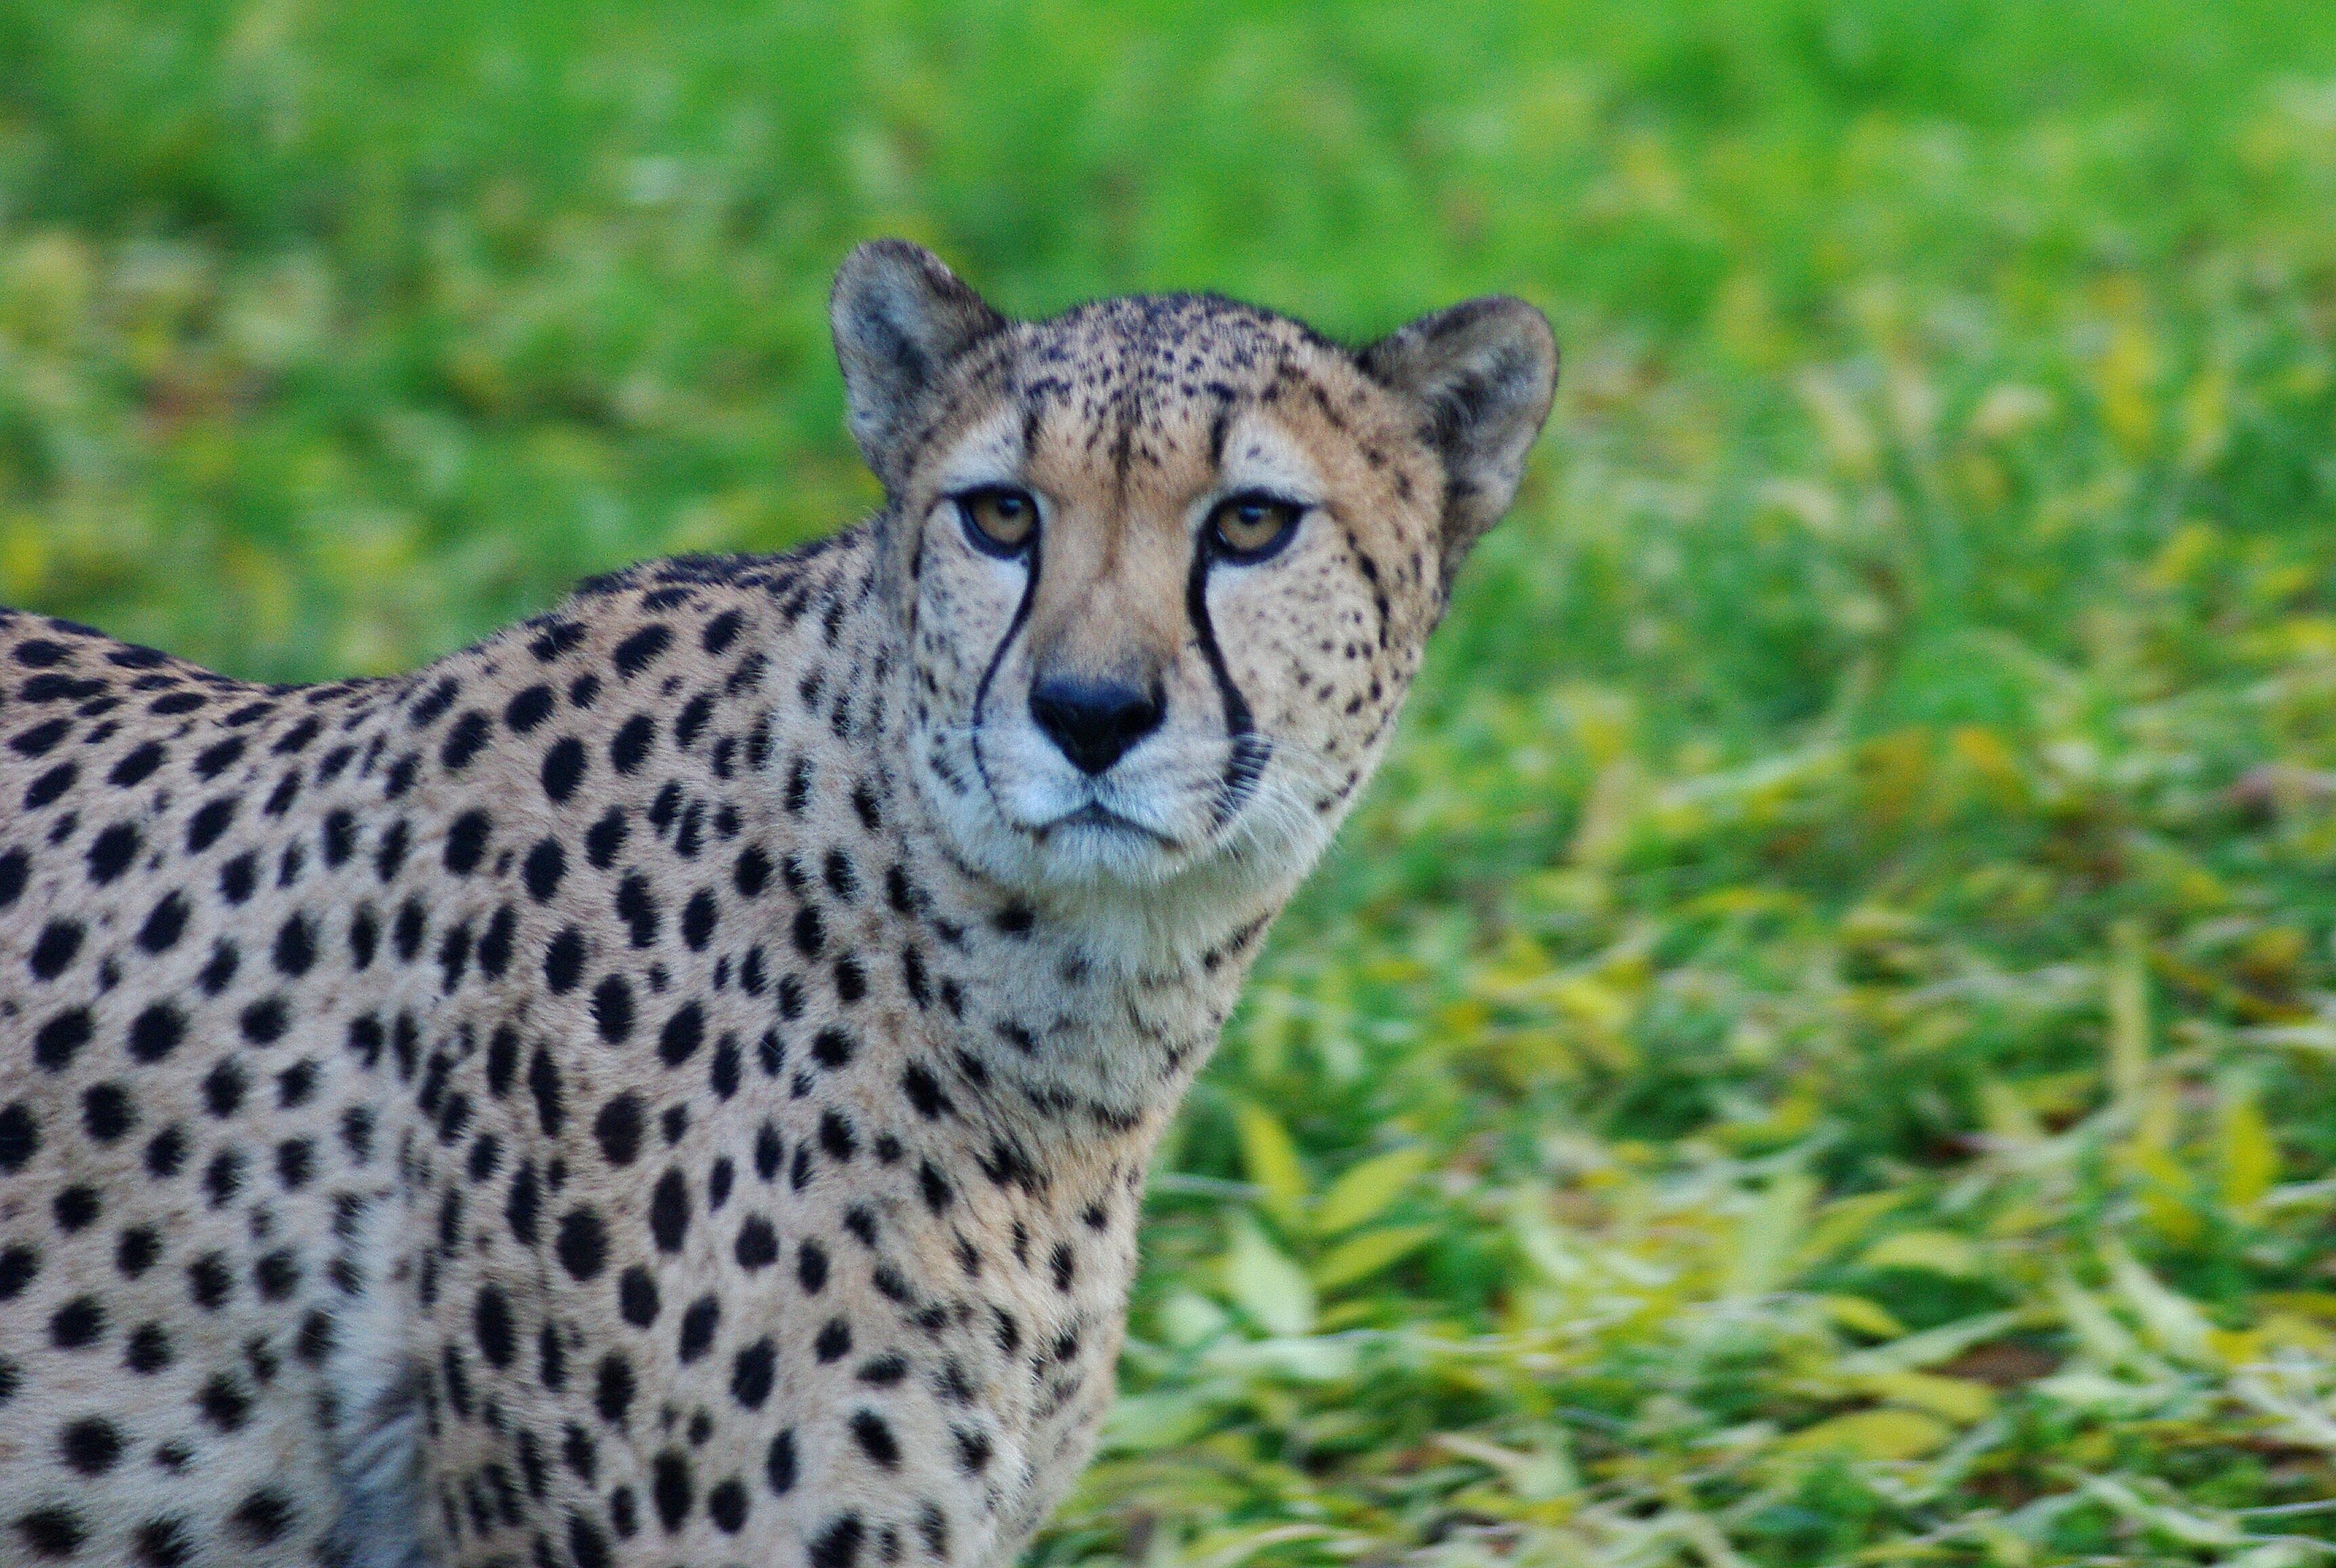 Cheetah, Animal, Brown, Cat, Wild, HQ Photo